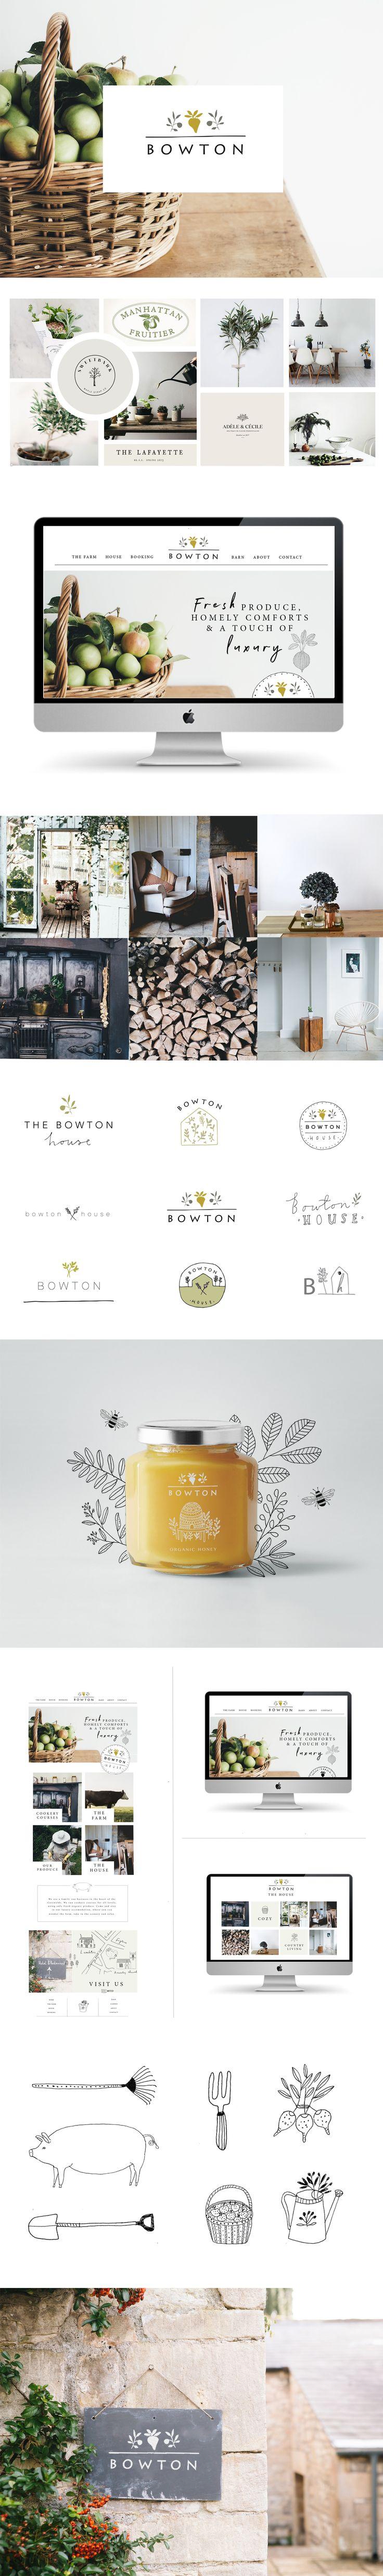 Branding and website by Ryn Frank